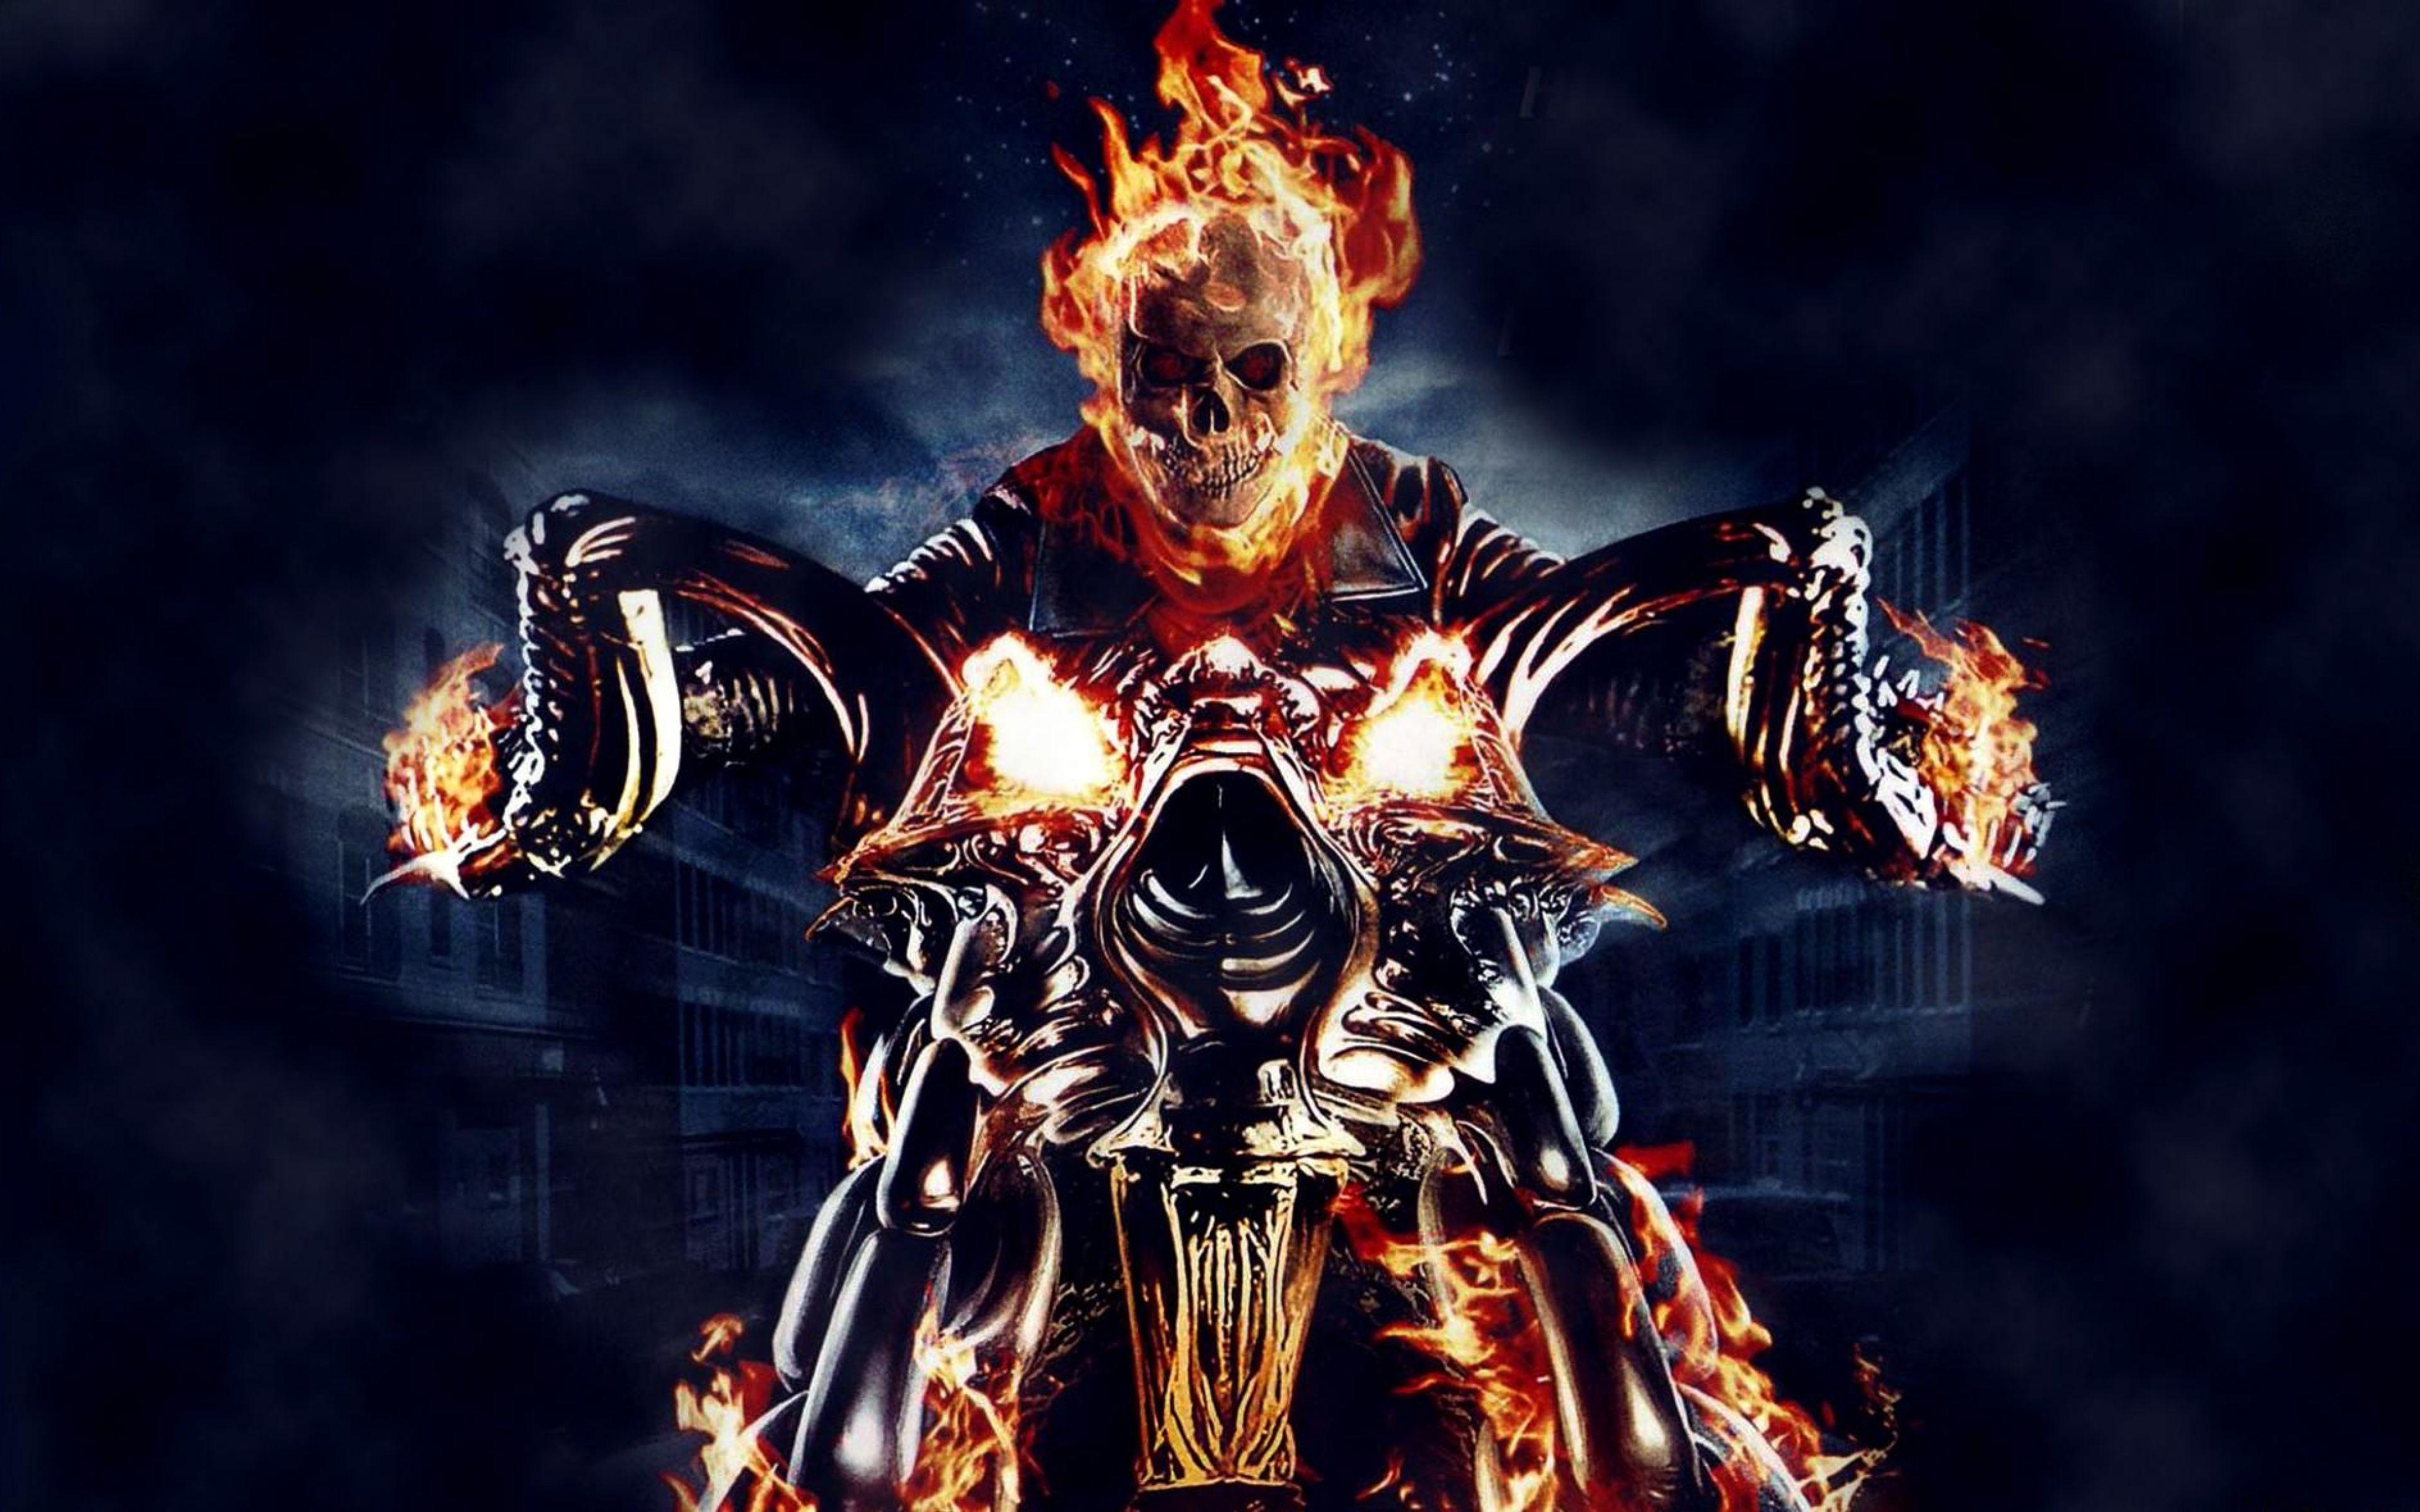 Ultra Hd 4k Ghost Rider Wallpapers Hd Desktop Backgrounds 3840x2400 Ghost Rider Wallpaper Ghost Rider Motorcycle Ghost Rider Johnny Blaze